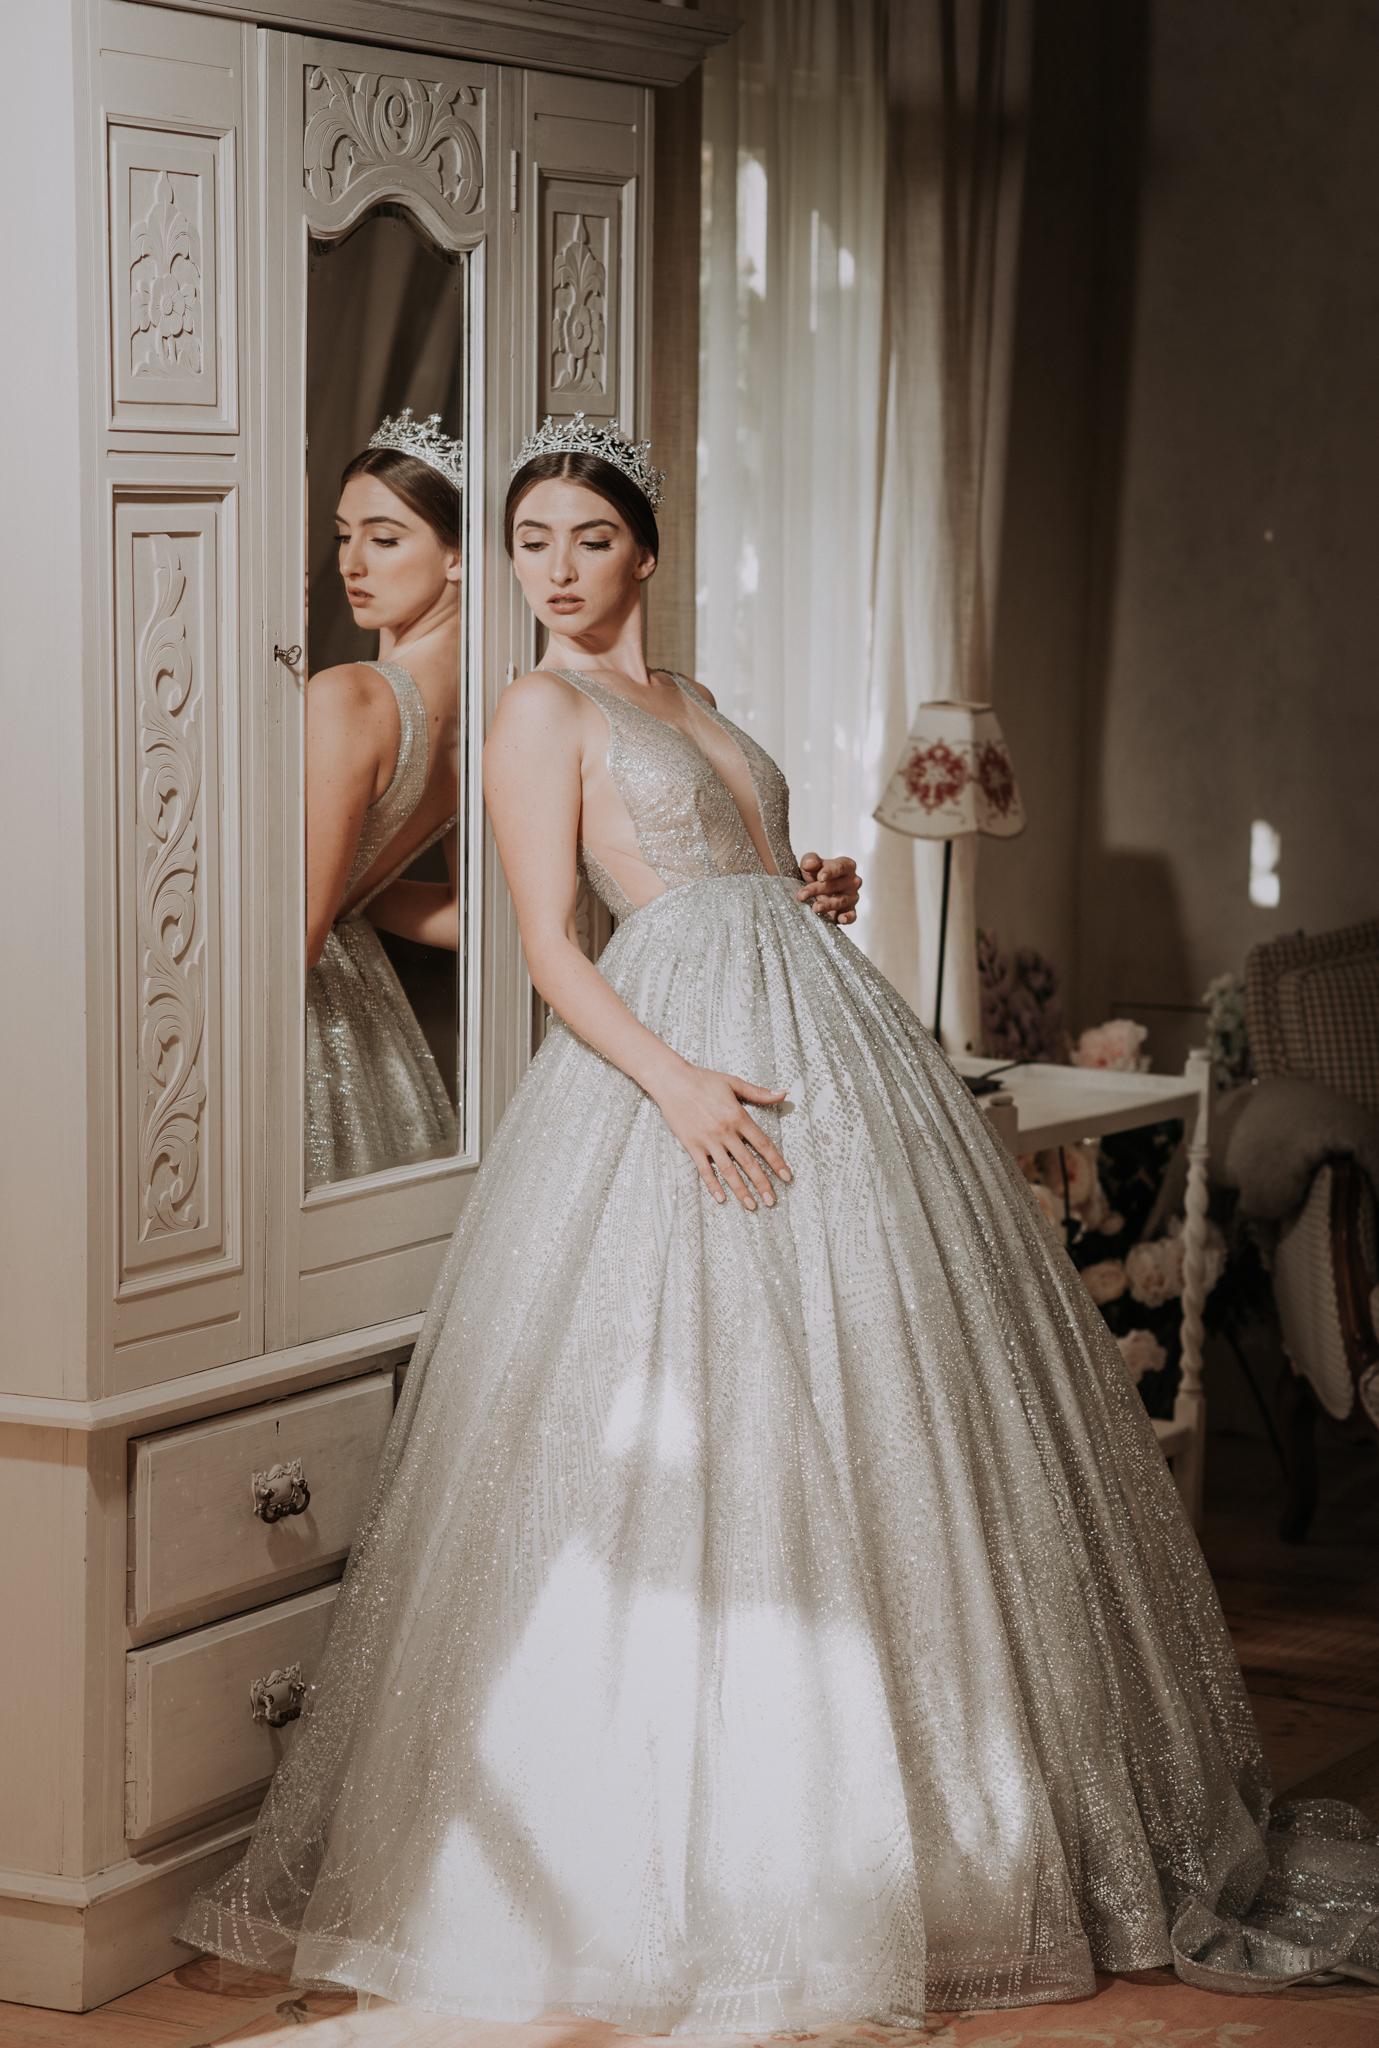 Ulyana Aster Bridal Wedding Gown • Deux Belettes Byron Bay Wedding Photographer • Lovelenscapes